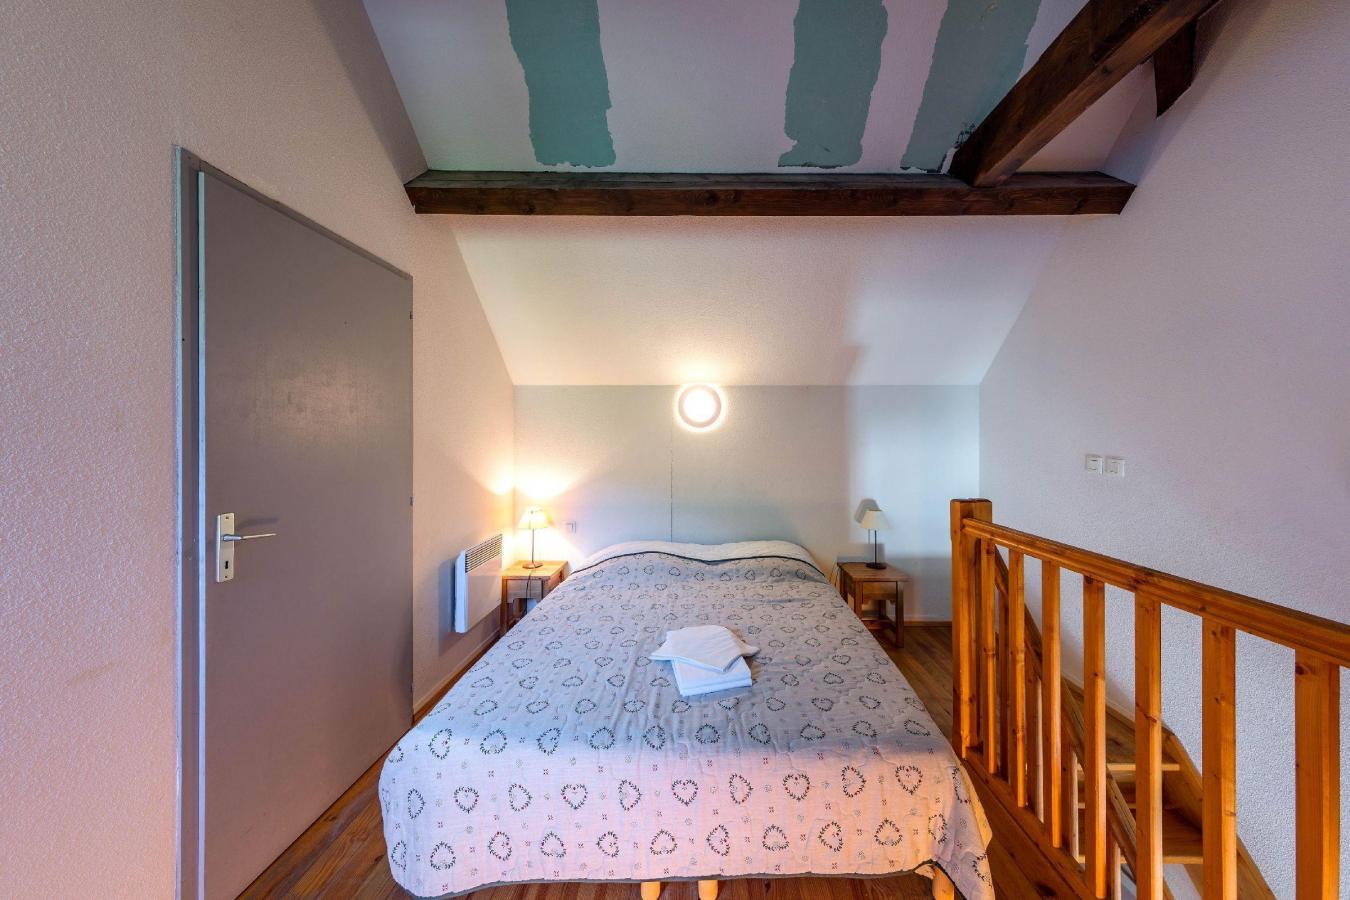 Location au ski Residence Les Trois Vallees - Saint Lary Soulan - Couchage